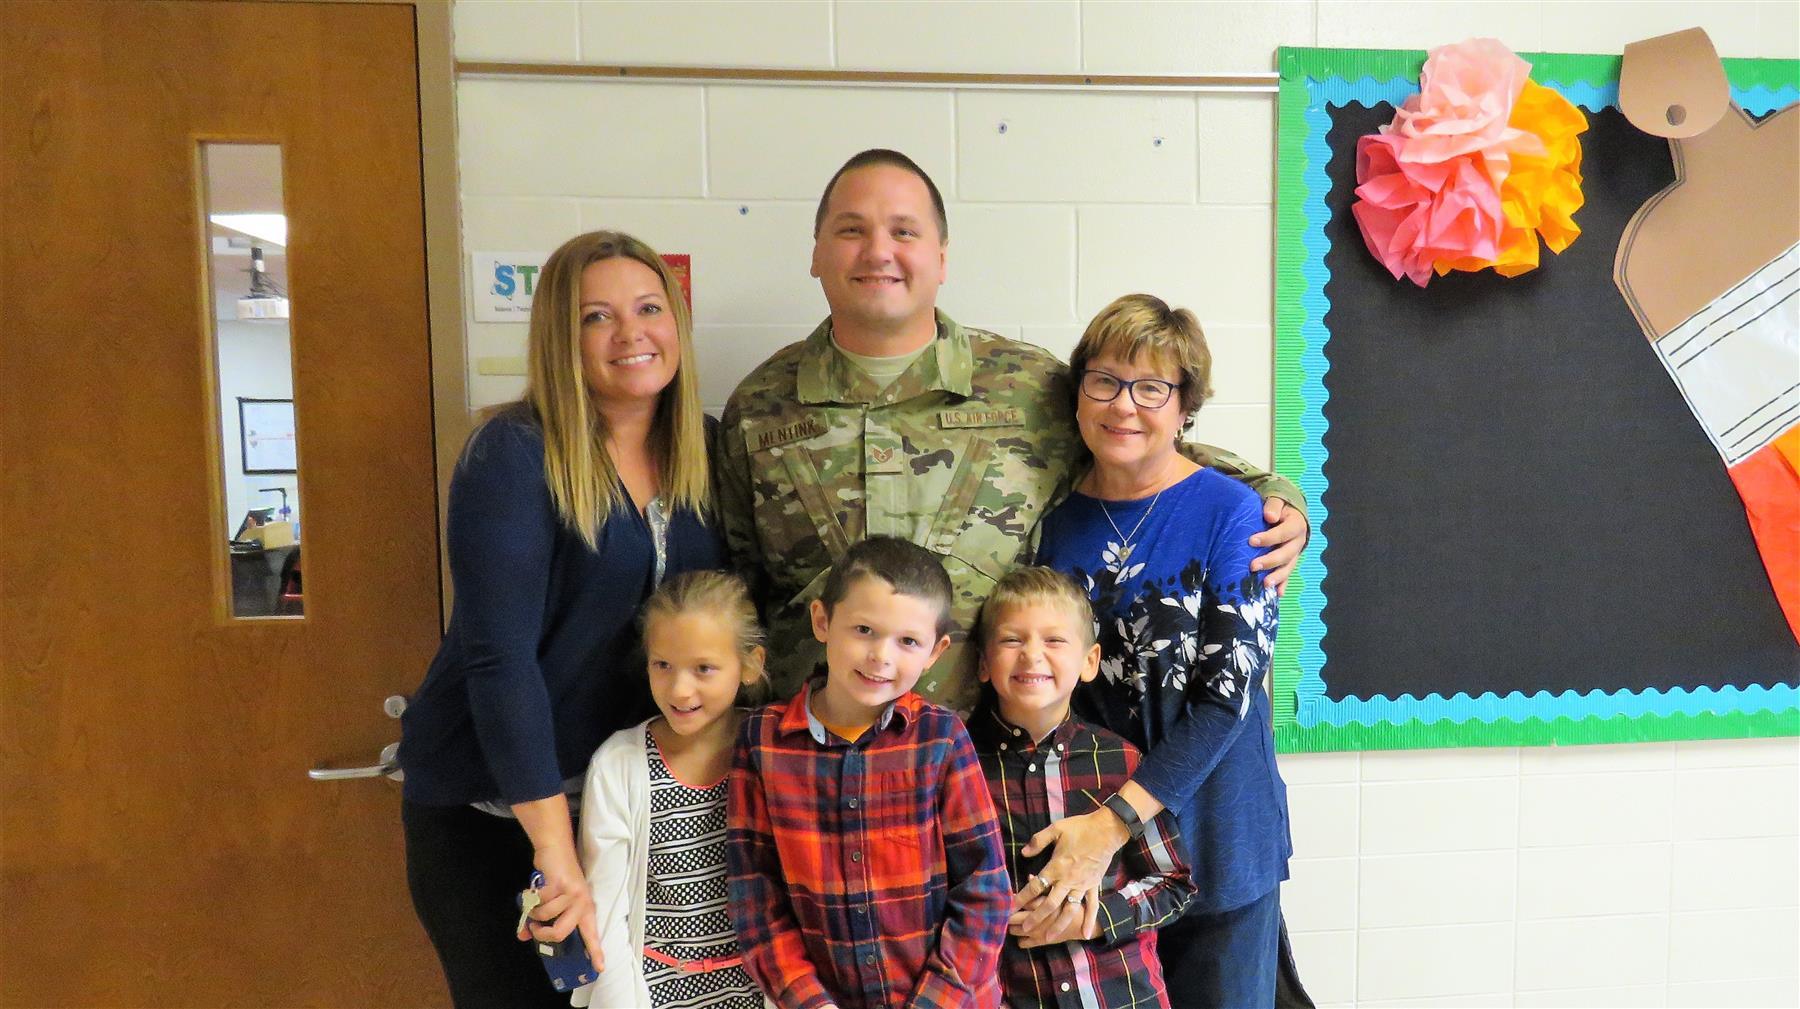 Jane Ball Elementary School / Overview